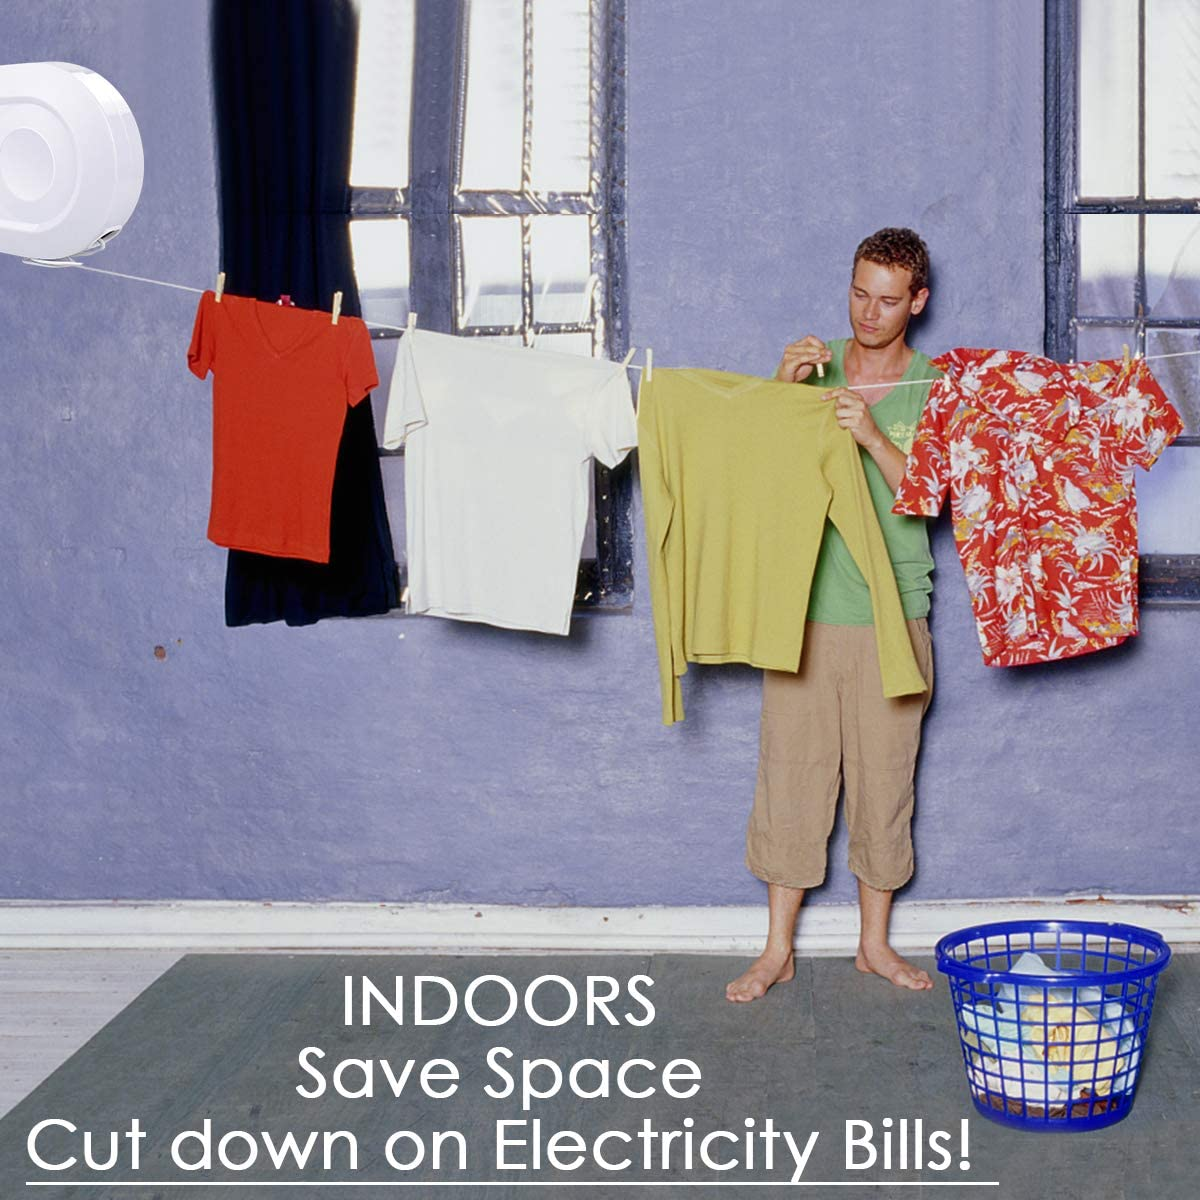 Outdoor Clothes Line Rustproof Steel Plastic Grey Heavy Duty Extending 15 m Muro Long Retractable Washing Line